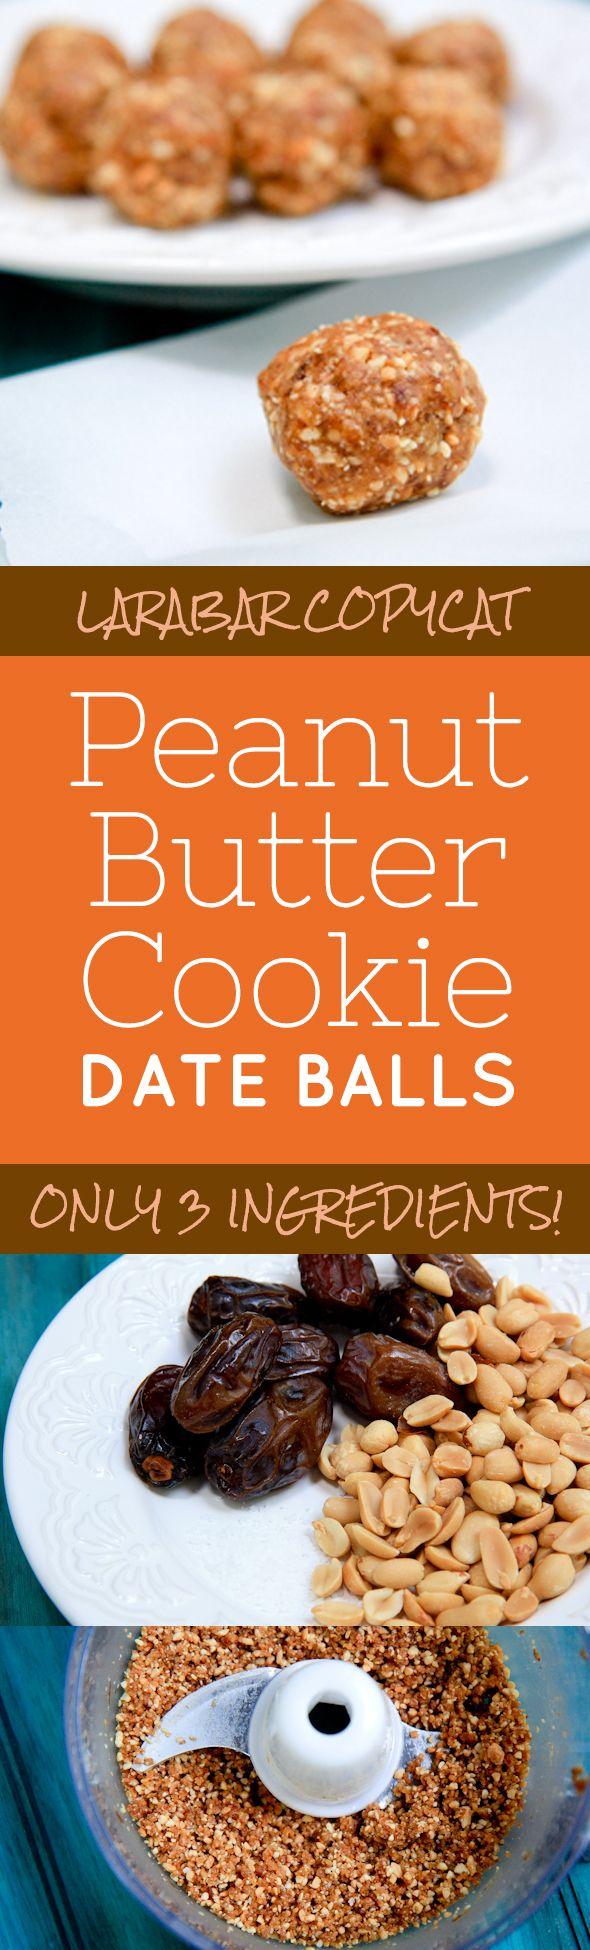 Peanut Butter Cookie Date Balls #vegan #3ingredients #dadlar #peanoett #energiball #energybar #energikule #energibar